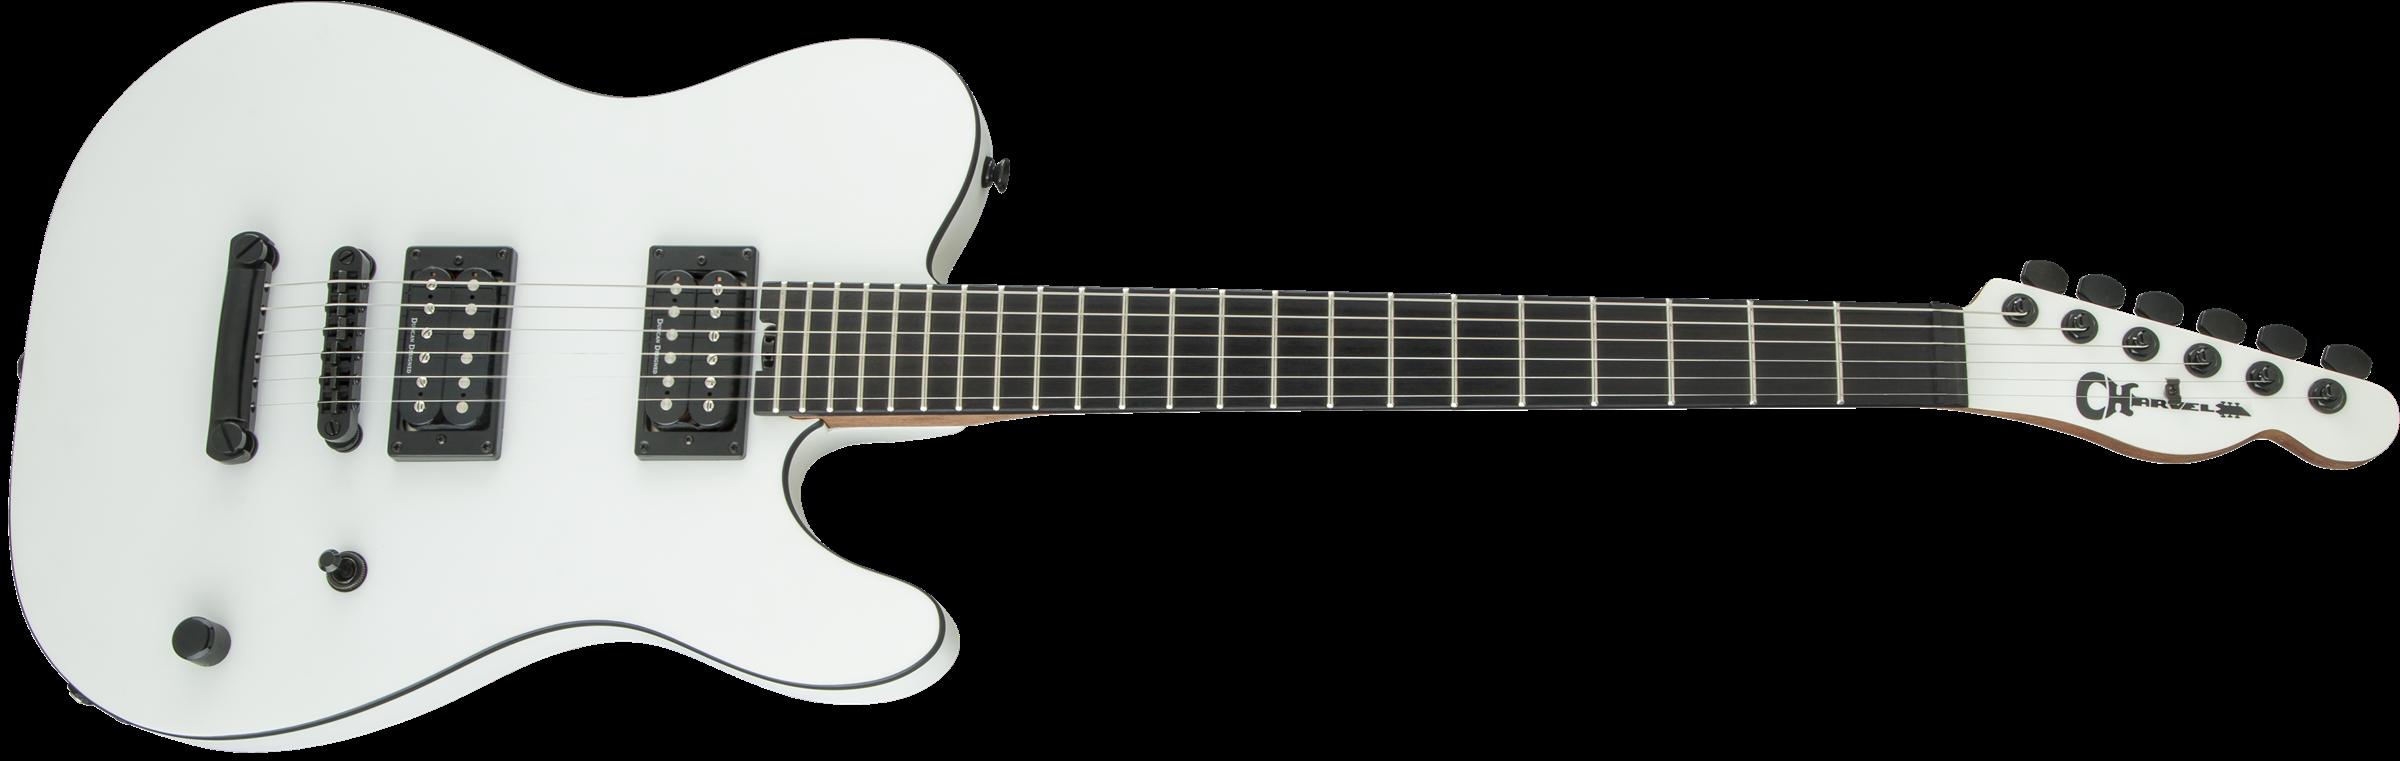 Joe Duplantier Signature Pro Mod San Dimas Style 2 Hh Artist Electric Guitar Diagram Intuitive Gallery